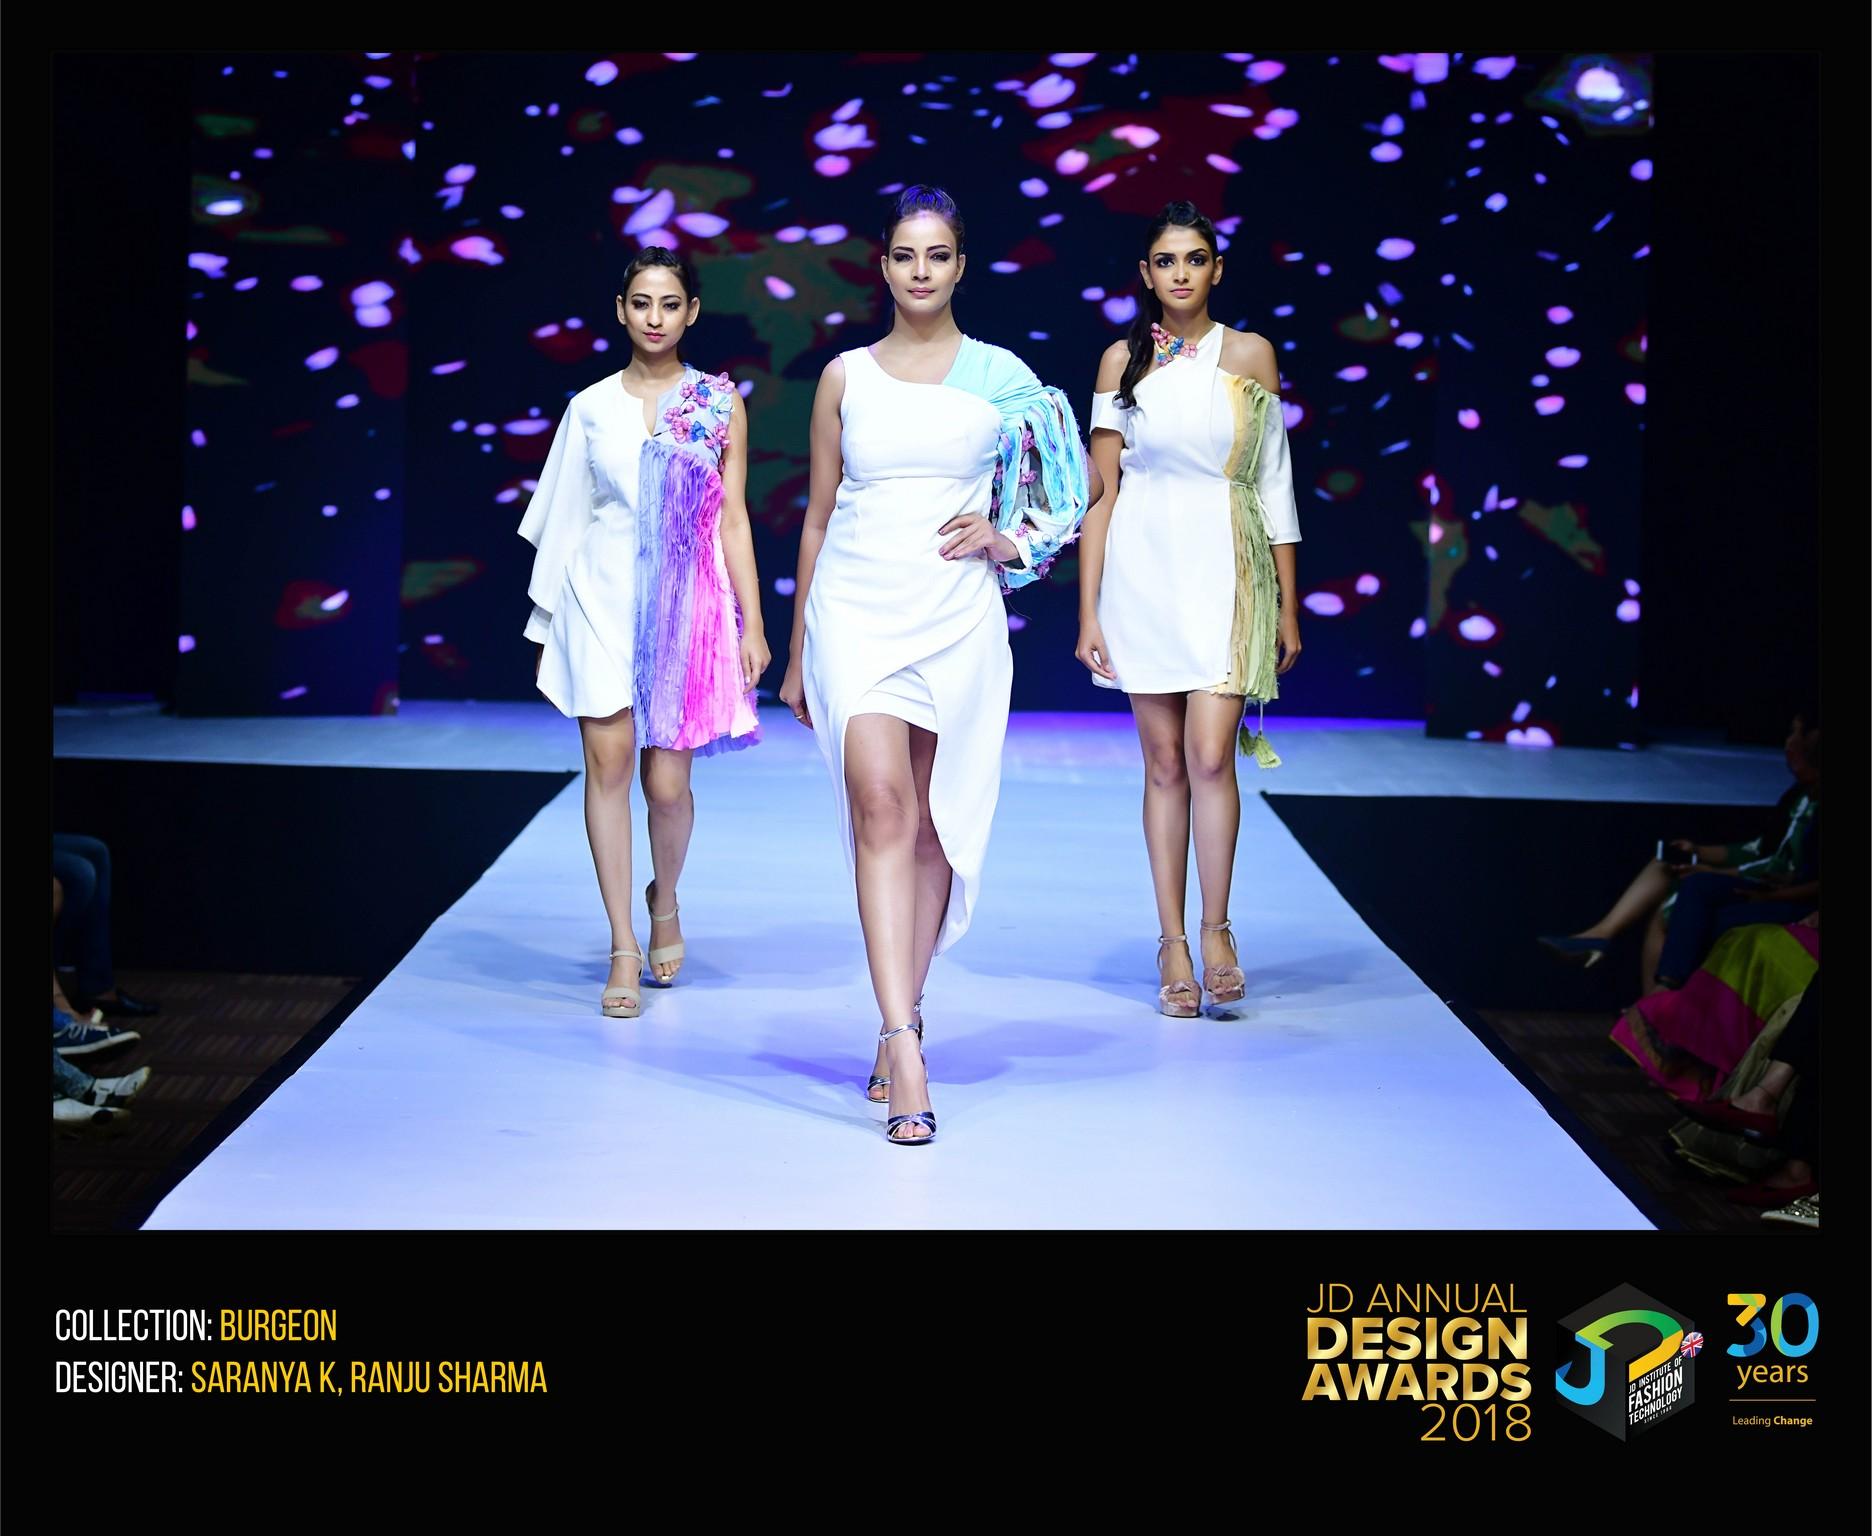 Burgeon – Change – JD Annual Design Awards 2018 | Designer: Ranju, Bhavani and Saranya | Photography : Jerin Nath (@jerin_nath) burgeon – change – jd annual design awards 2018 - BURGEON 7 - Burgeon – Change – JD Annual Design Awards 2018